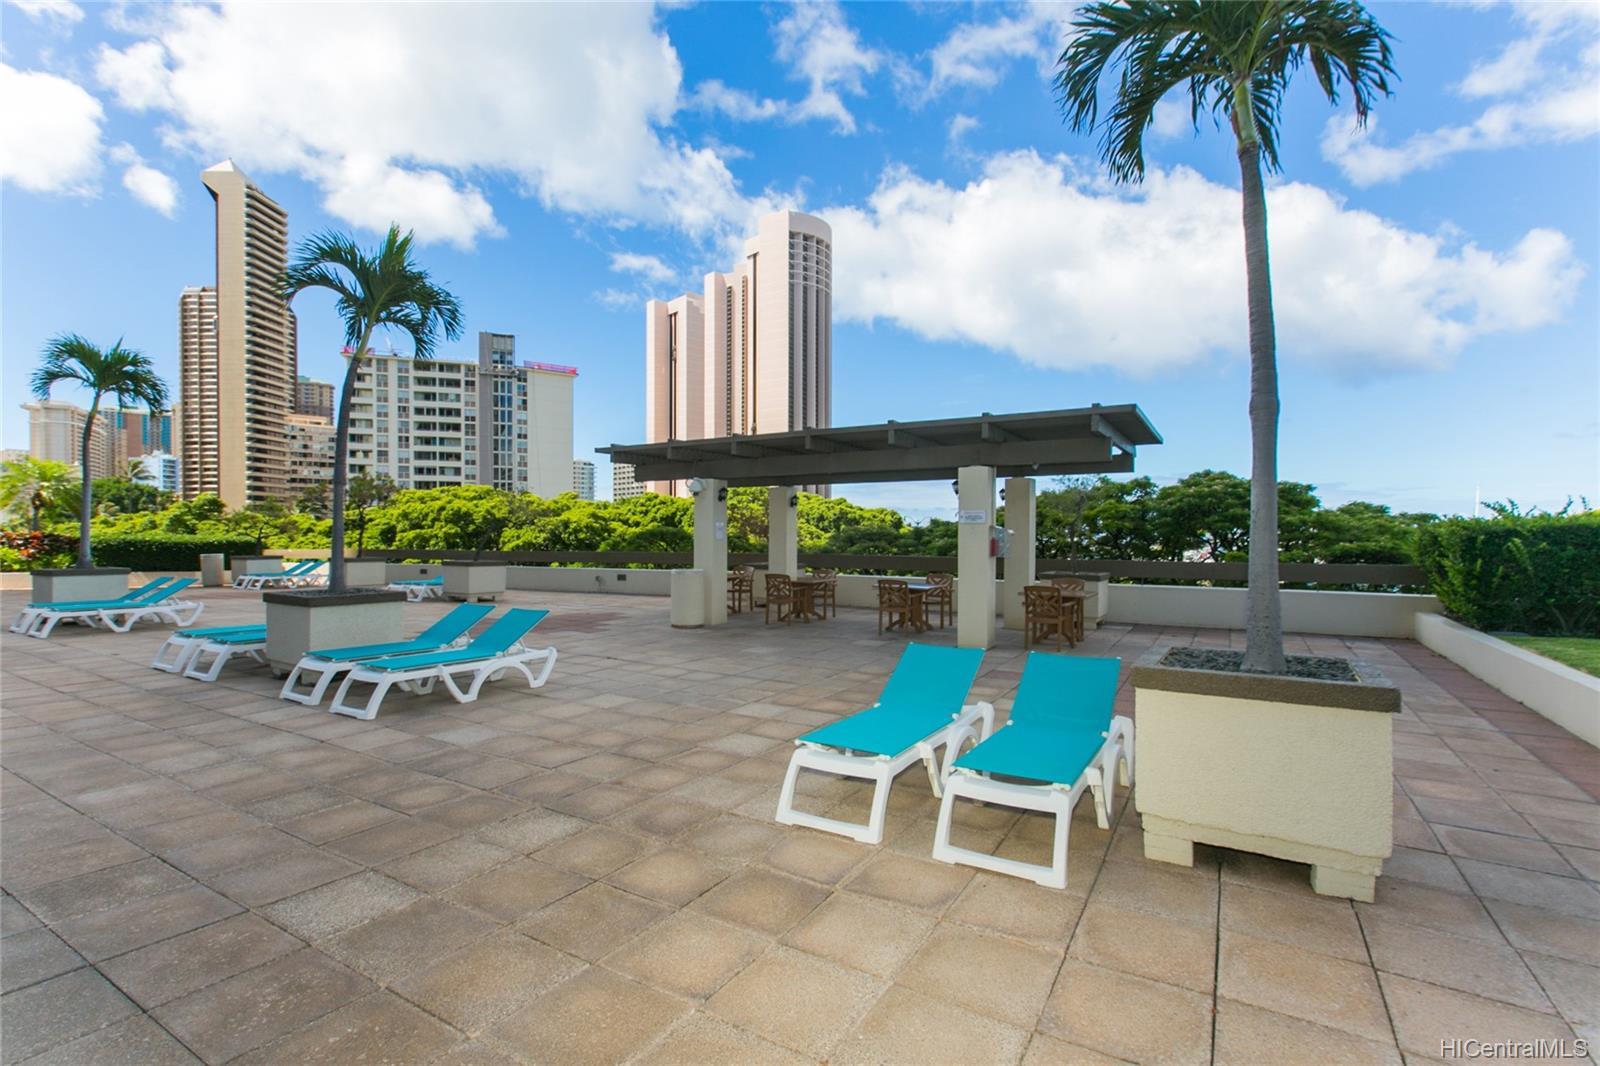 1600 Ala Moana Blvd Honolulu - Rental - photo 22 of 25